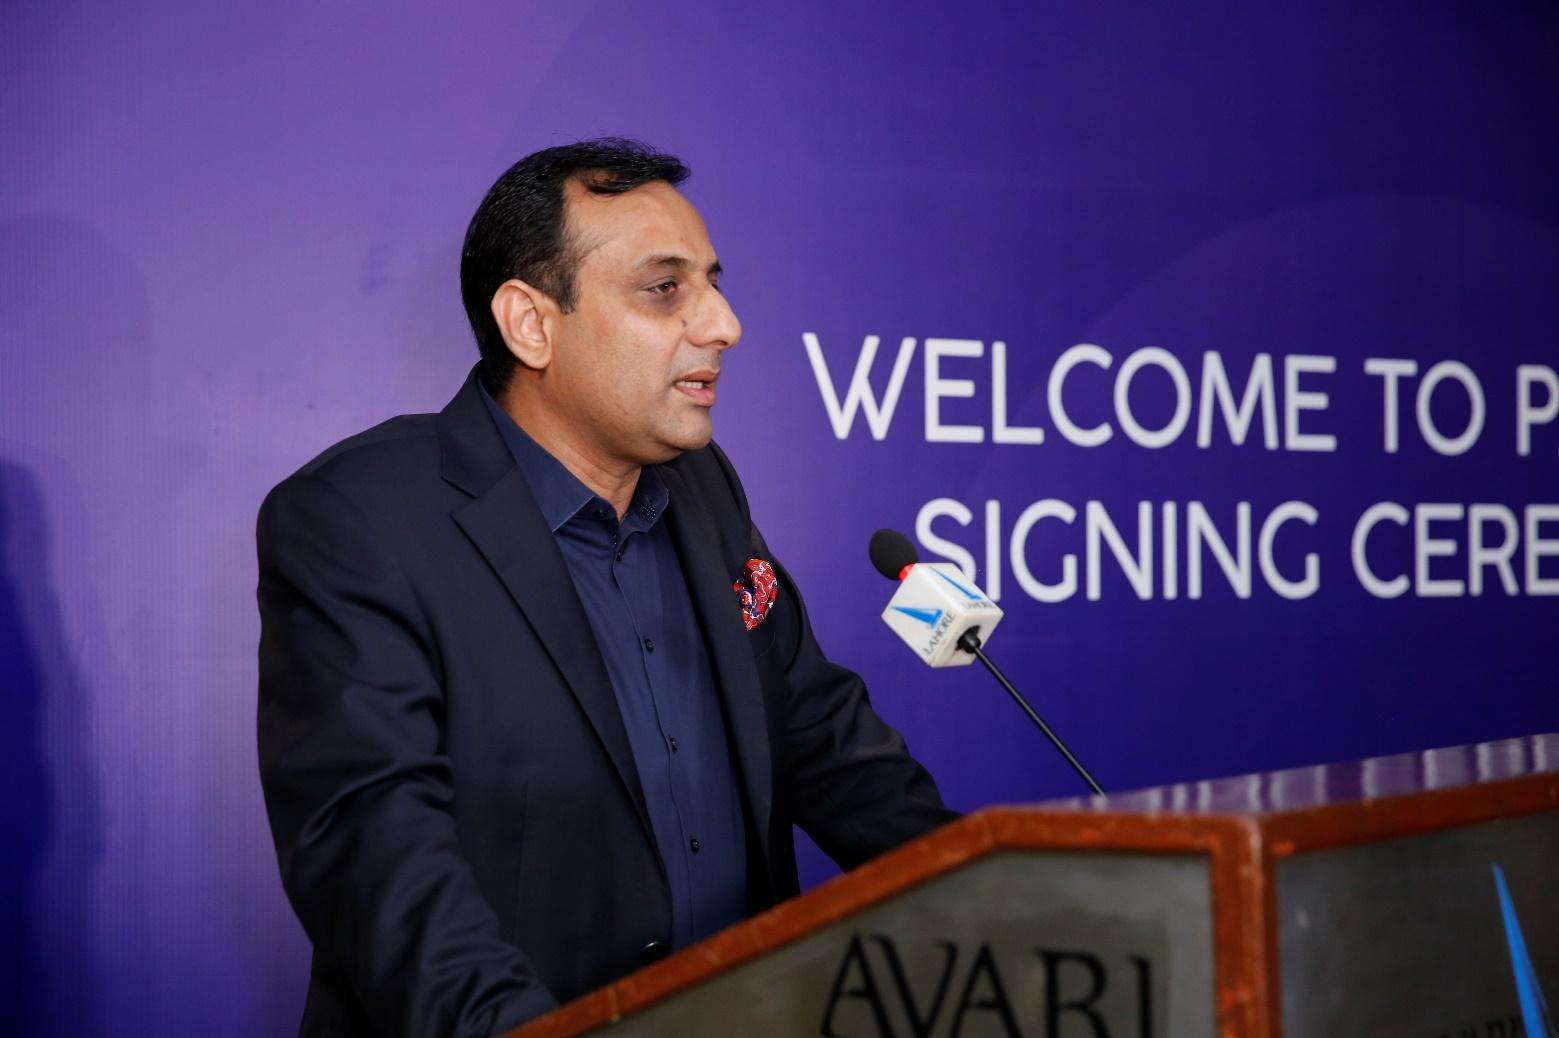 C:UsersSairaDesktopSocial MediaMr. Muzaffar Piracha ( CEO Airlink) showed his excitement during the partner signing ceremony..JPG